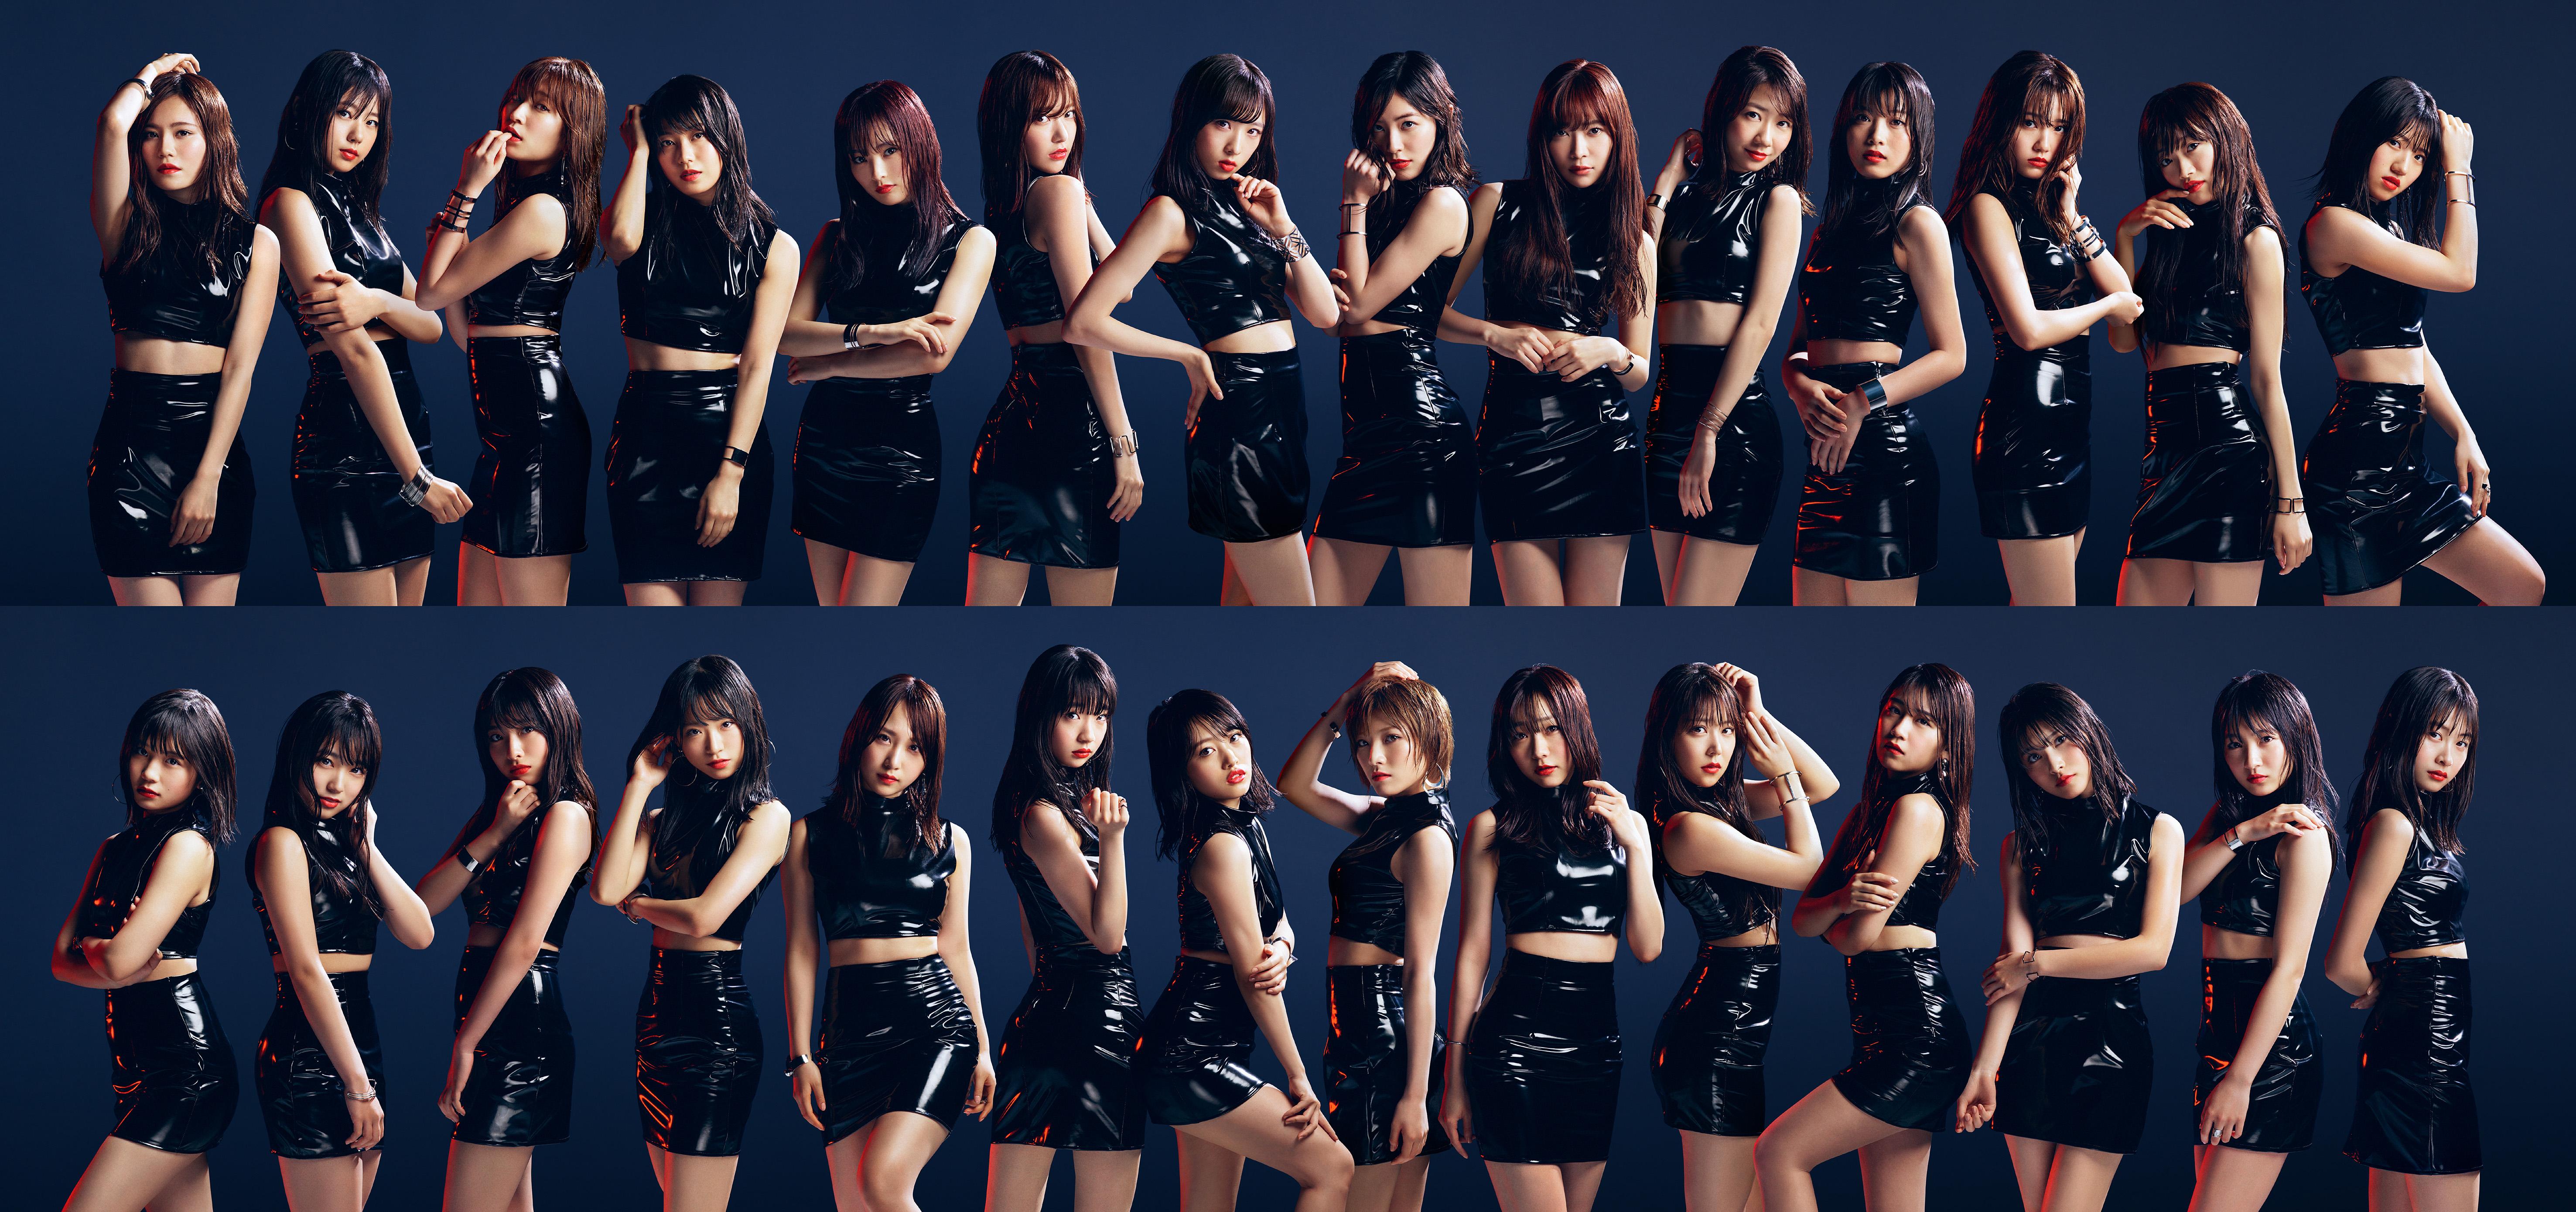 2579d85a4cd256 AKB48、小栗有以が初センターを務める「Teacher Teacher」のMV解禁 | OKMusic